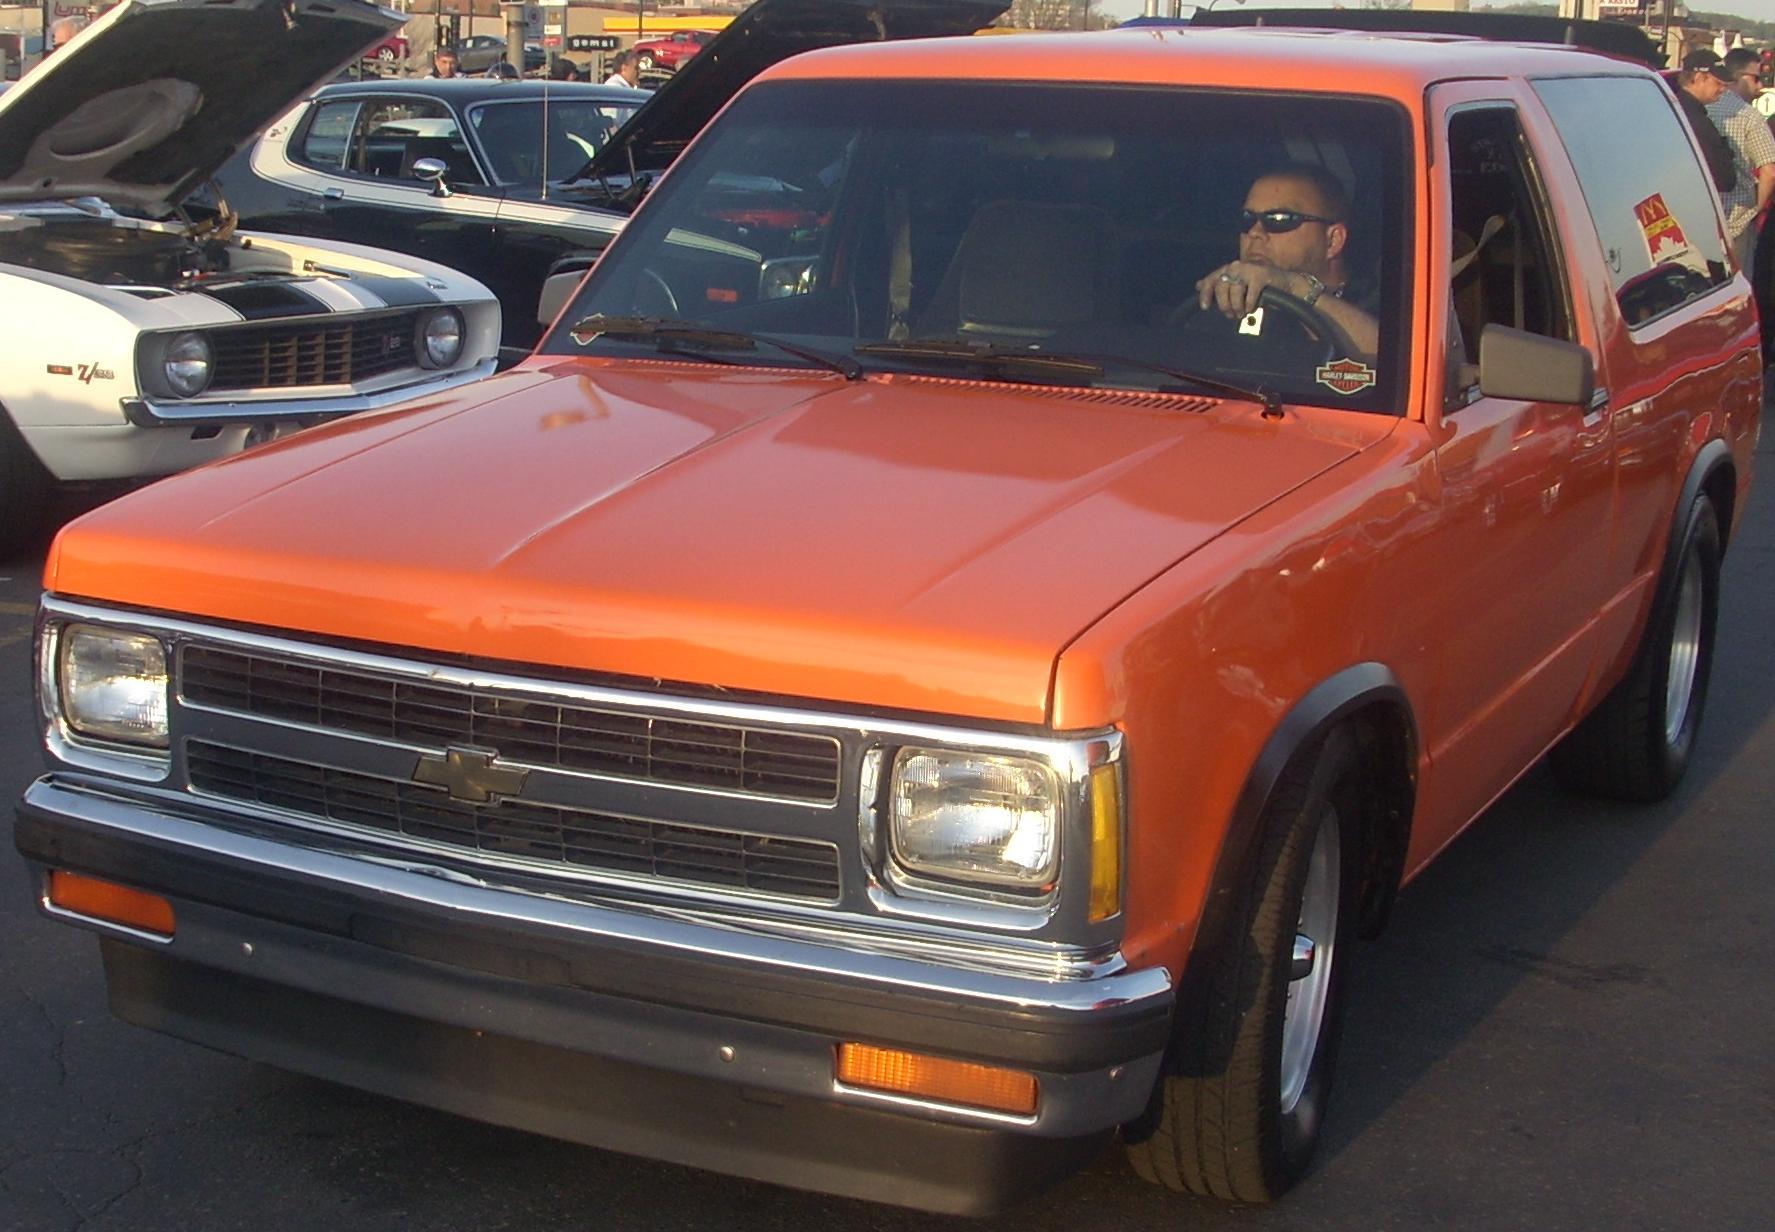 File Tuned Chevrolet S 10 Blazer 2 Door Orange Julep Jpg